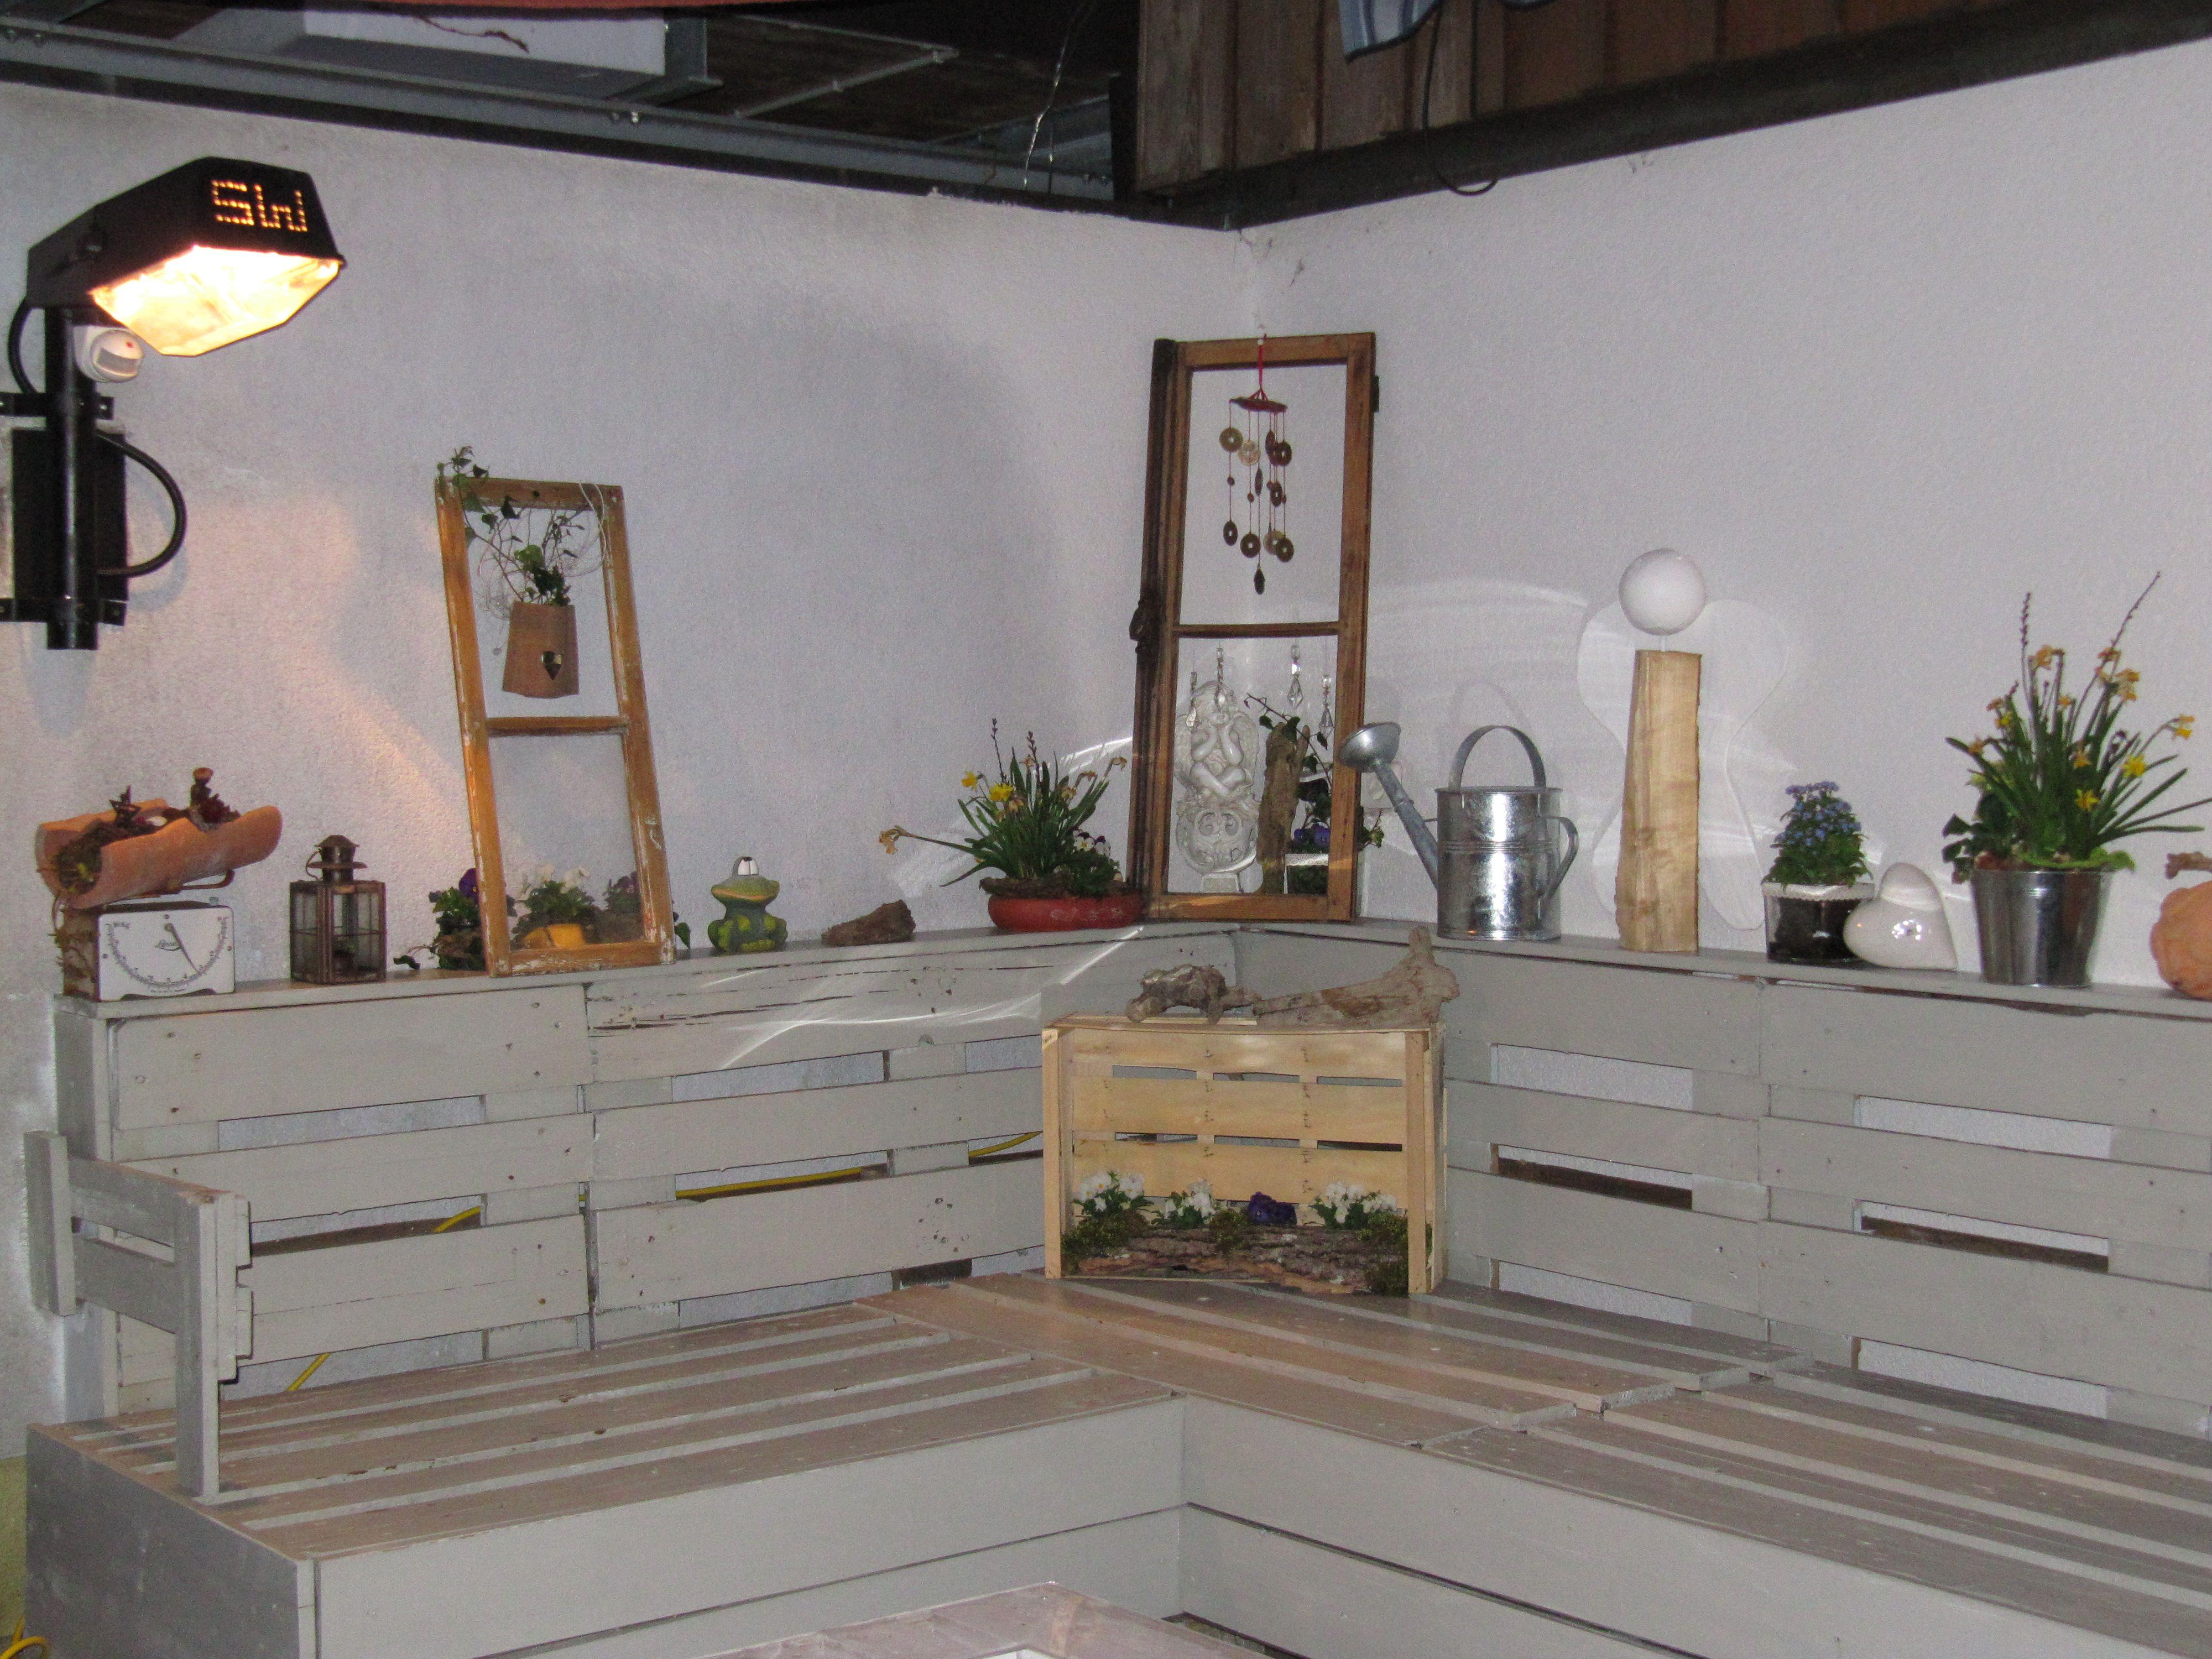 paletten m bel selbst ist die frau 2 pinterest paletten m bel m bel und frau. Black Bedroom Furniture Sets. Home Design Ideas